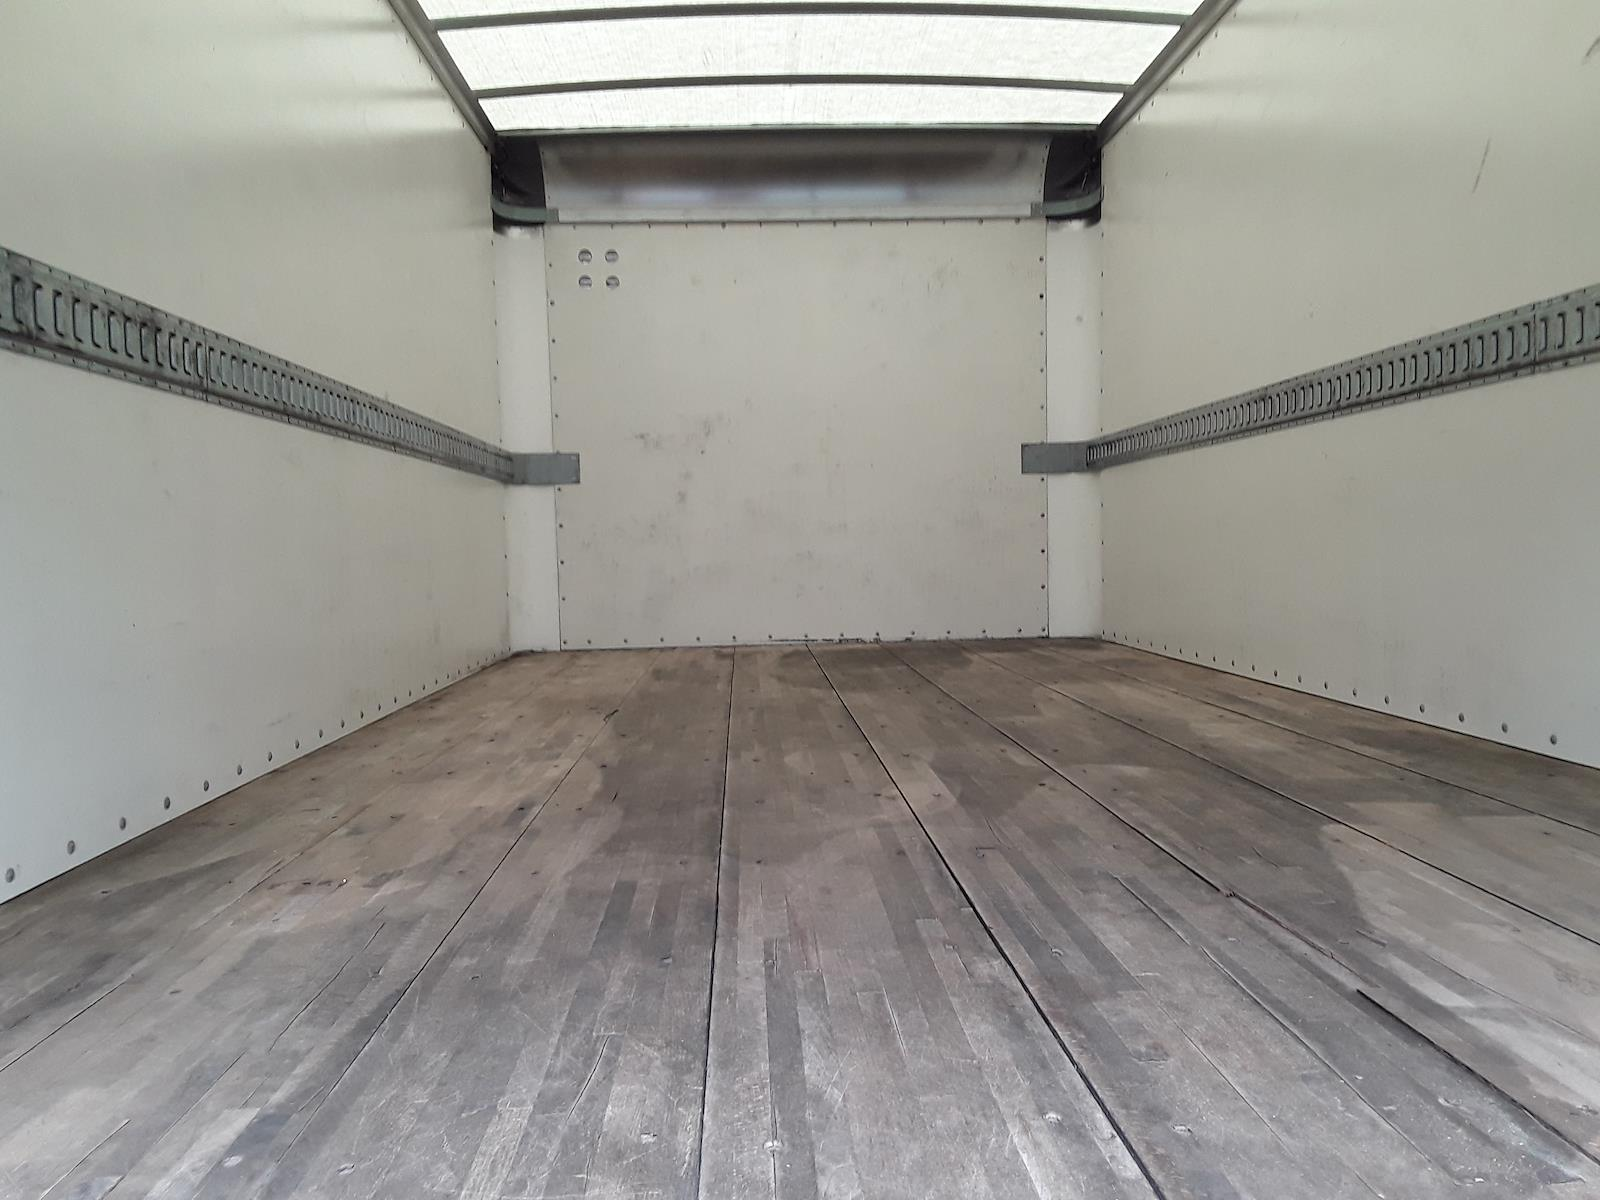 2016 Isuzu NPR Regular Cab 4x2, Dry Freight #683133 - photo 4